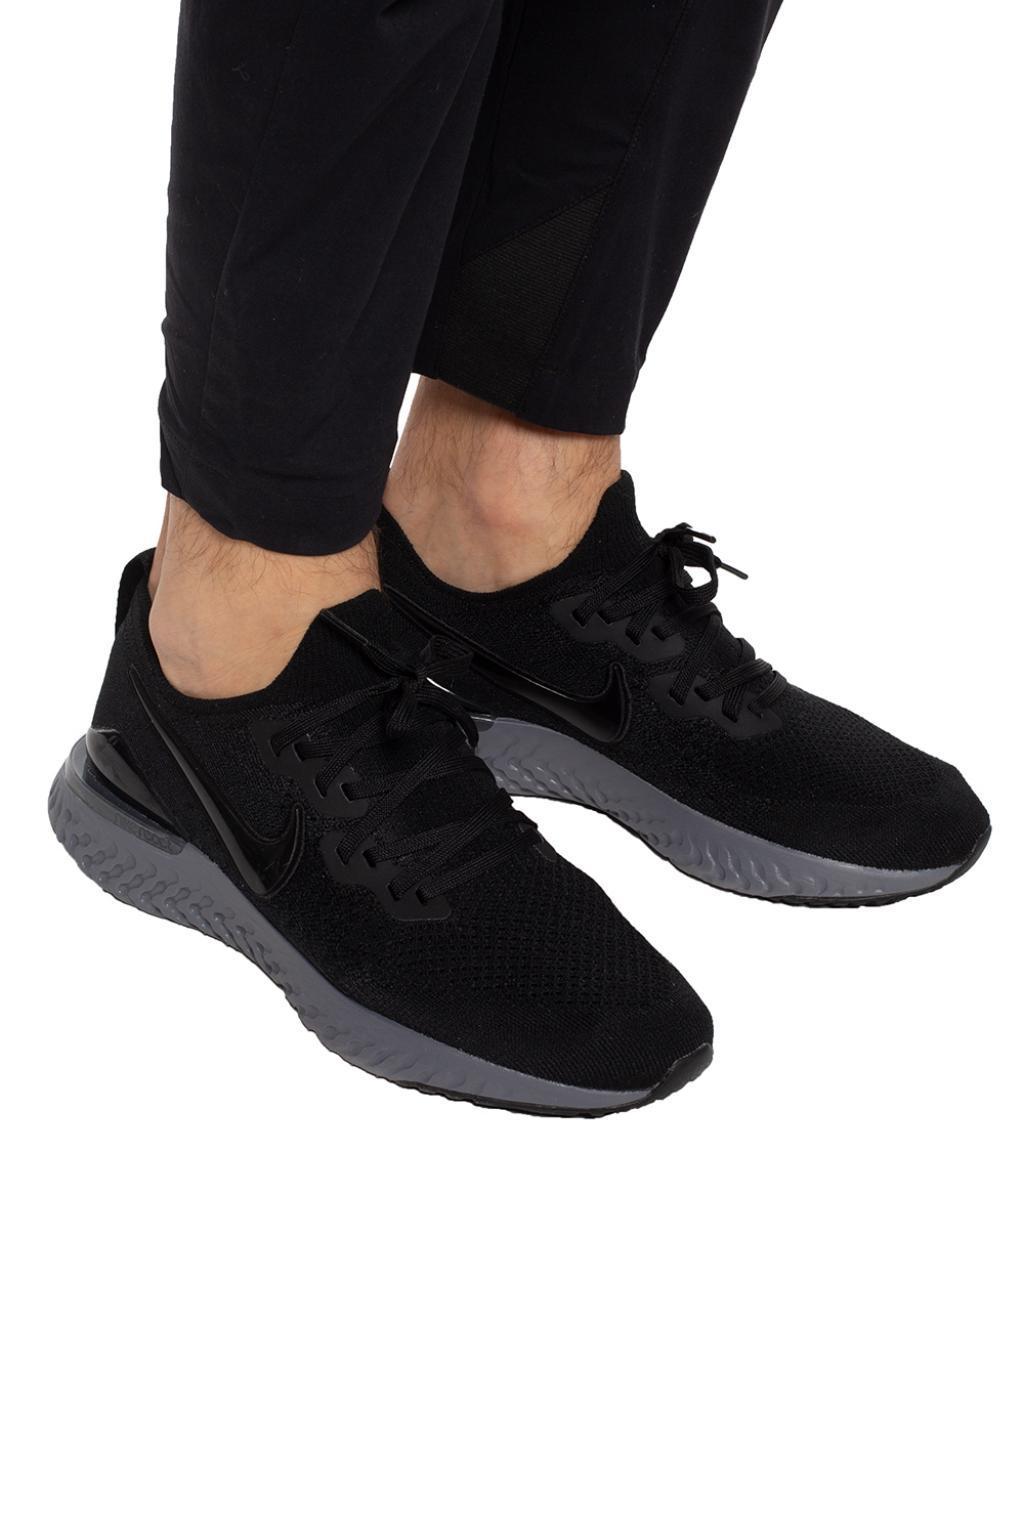 2ea8f7eadc5 Nike - Black  epic React Flytknit 2  Sneakers for Men - Lyst. View  fullscreen